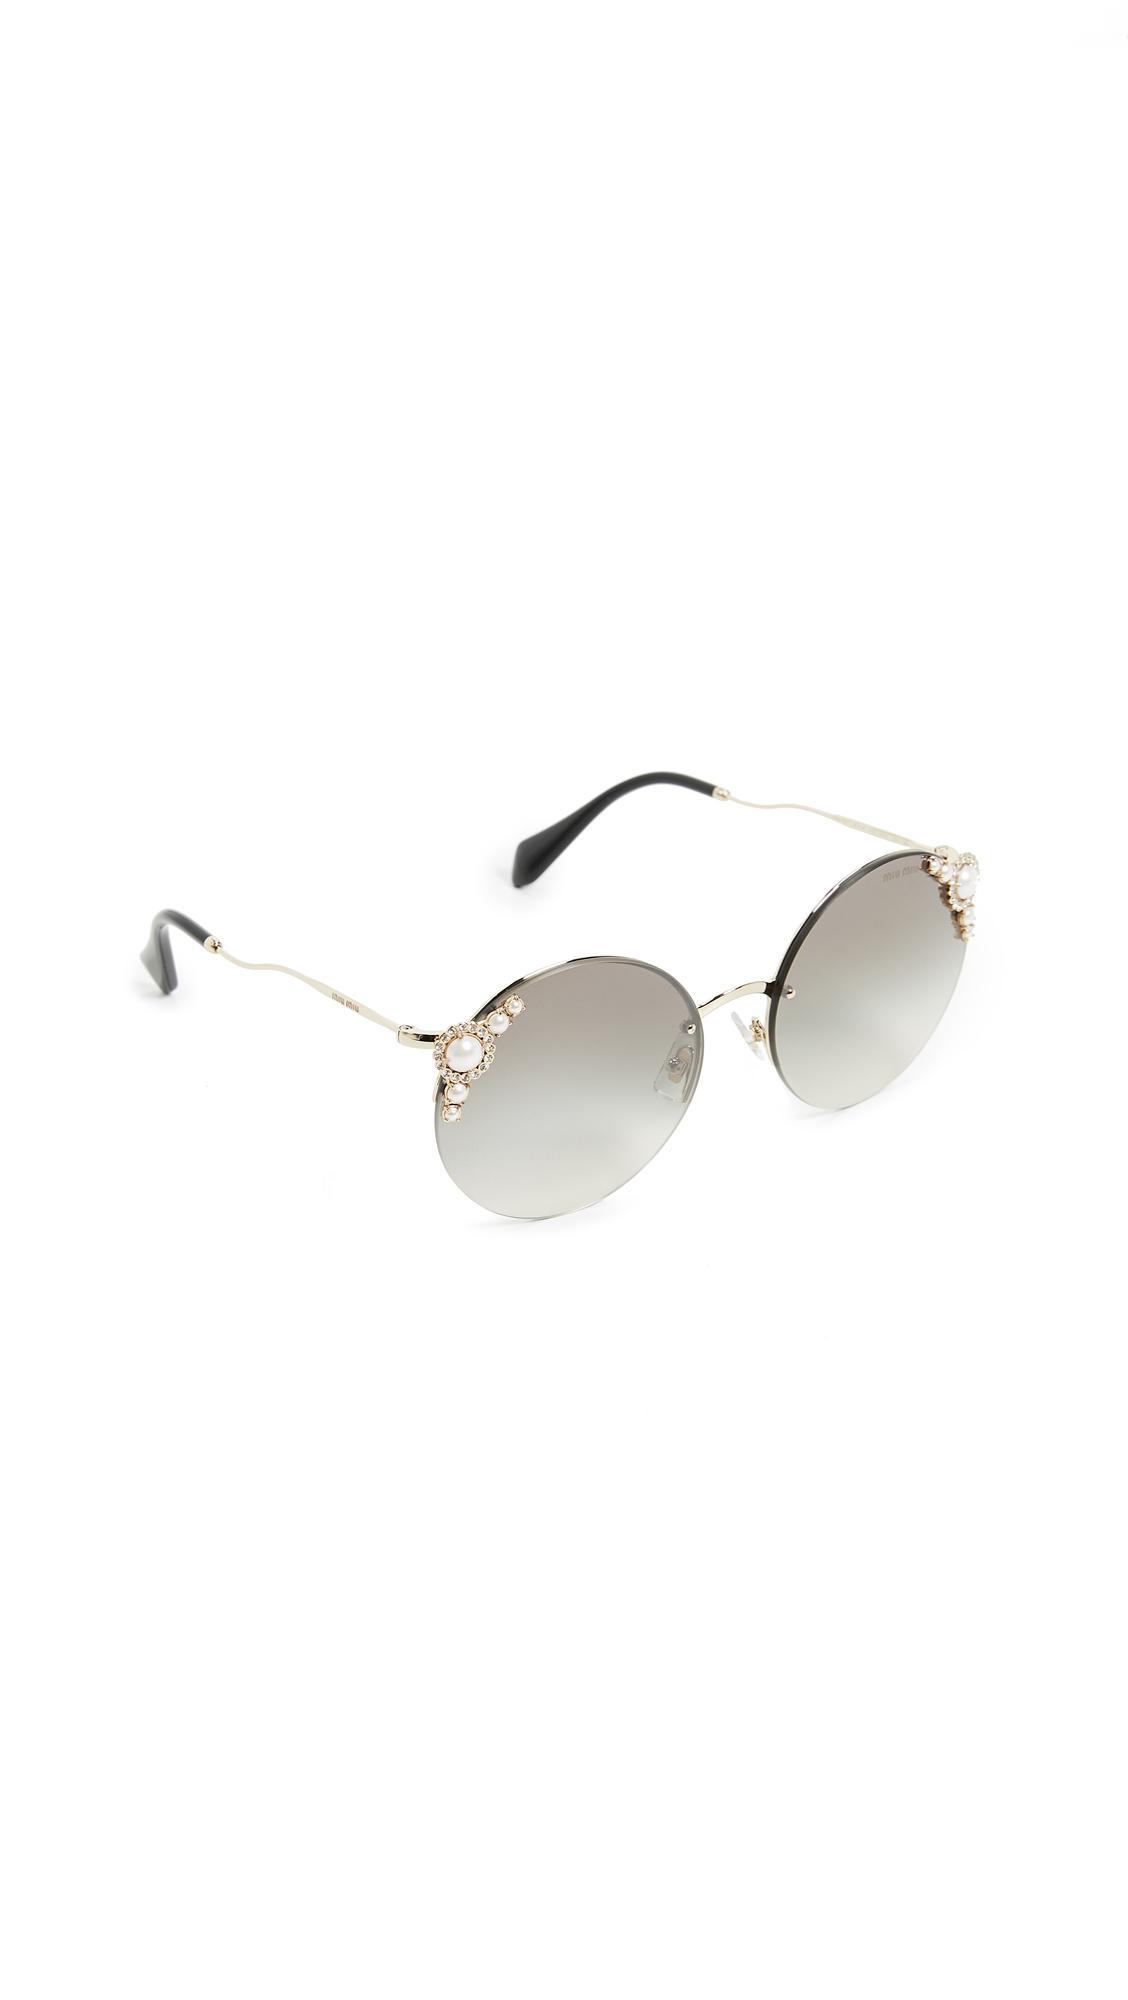 b06fabfb4b8 Miu Miu Round Imitation Pearl Sunglasses In Pale Gold Grey Silver ...